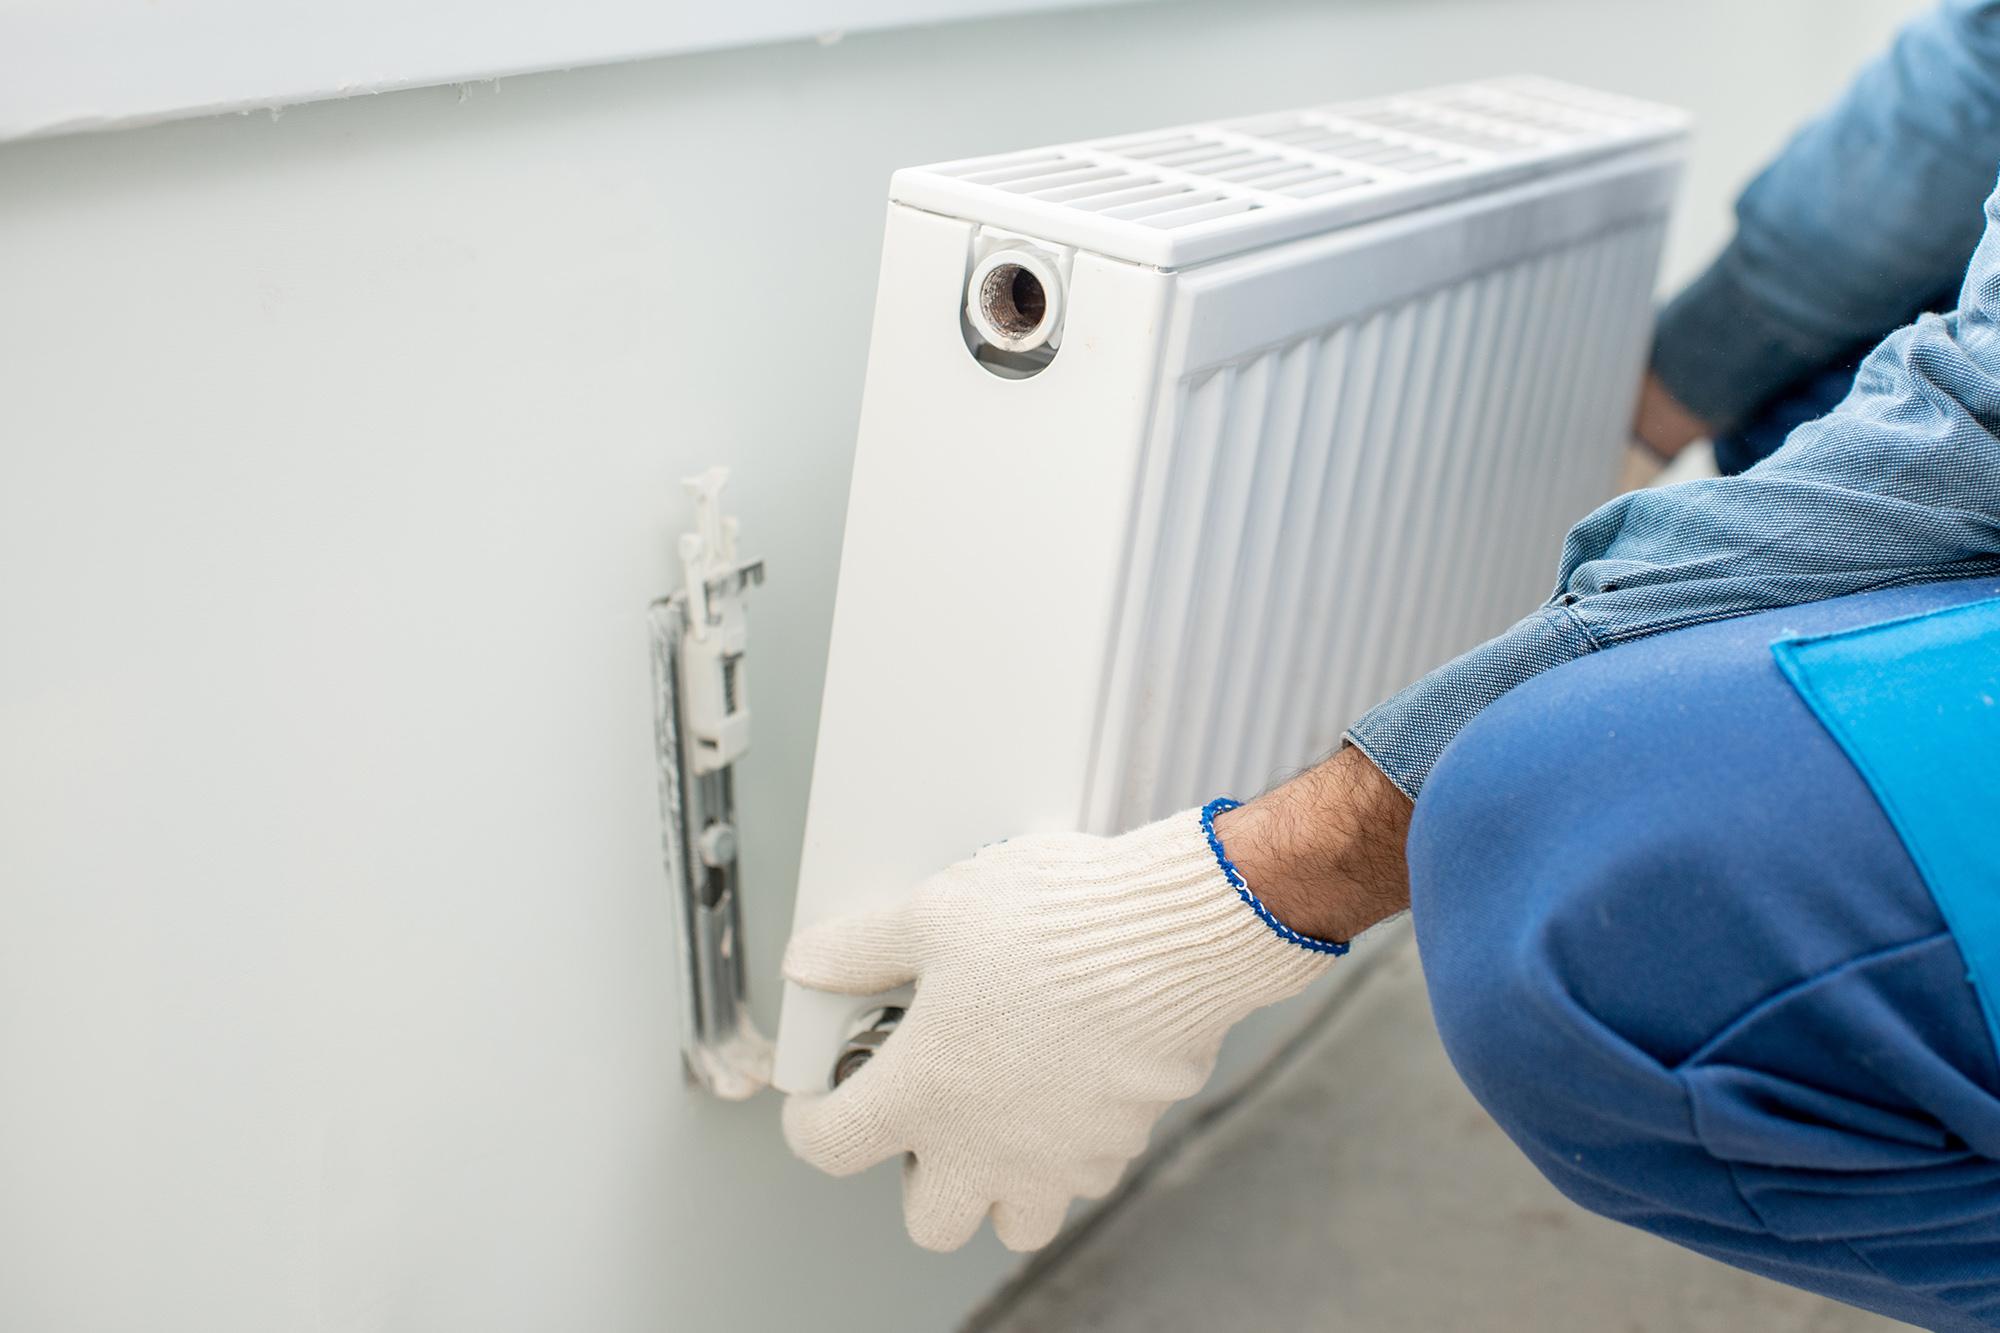 Removing radiators to dectorate